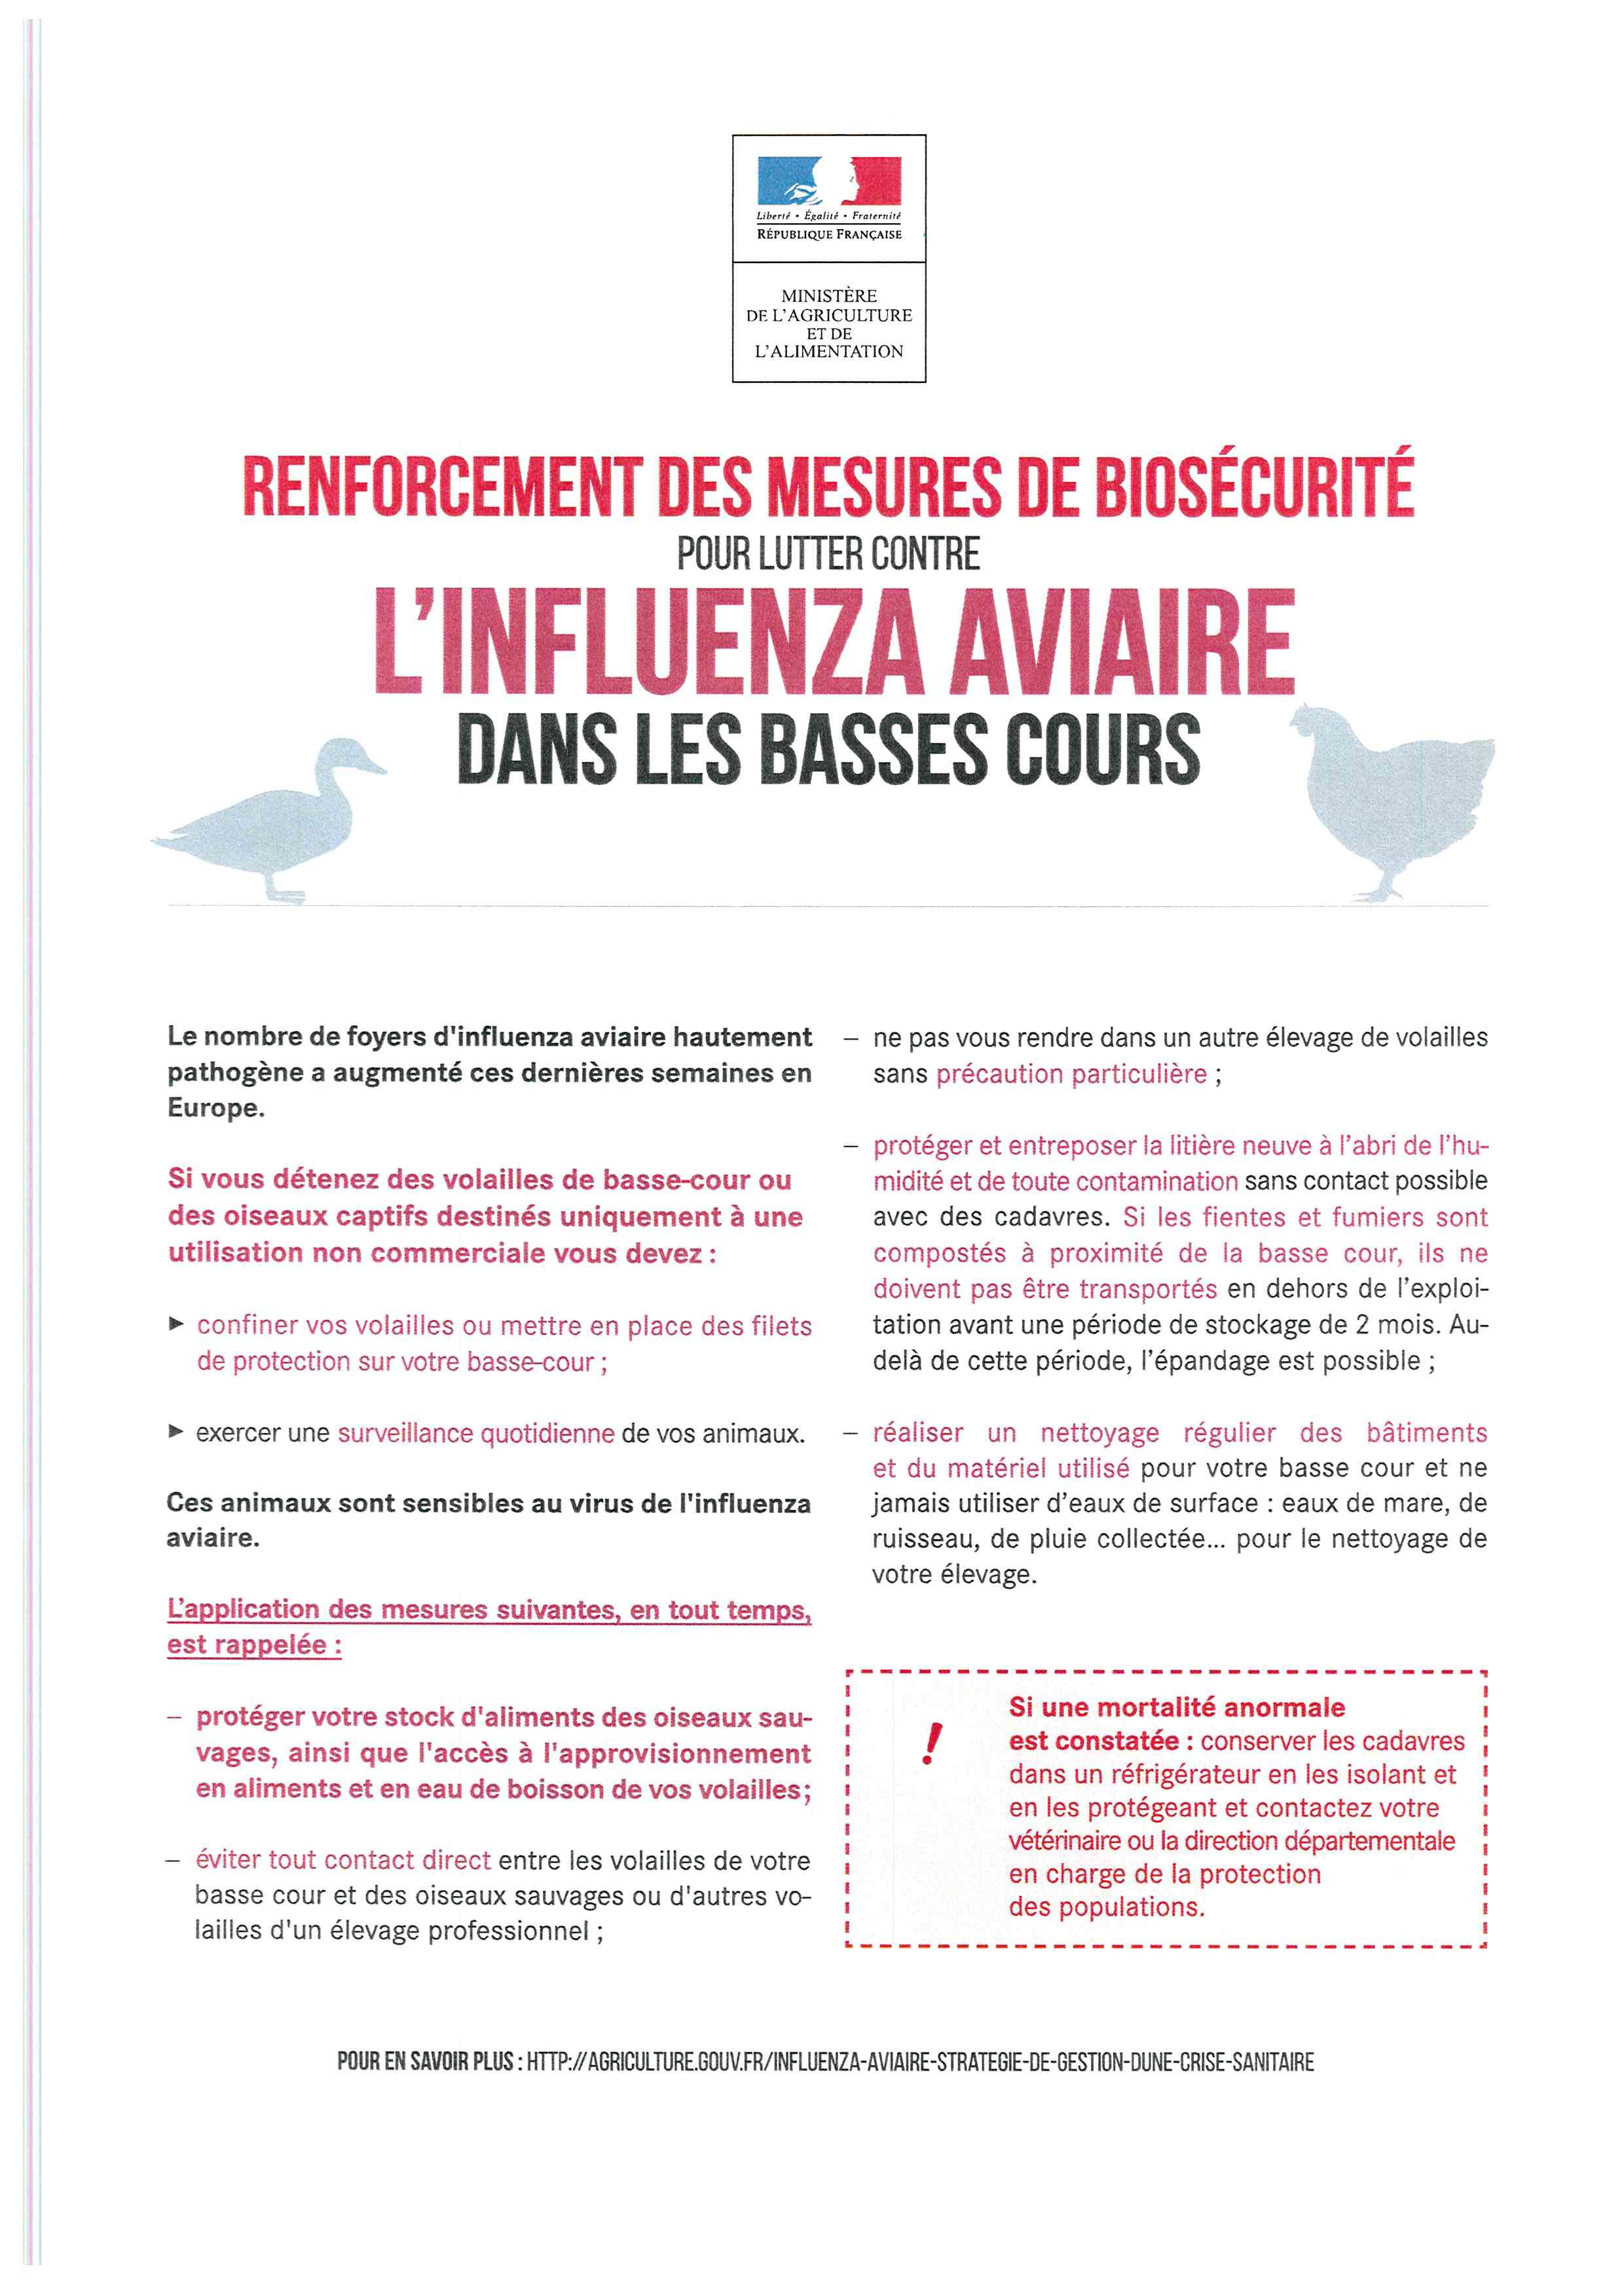 L'influenza aviaire